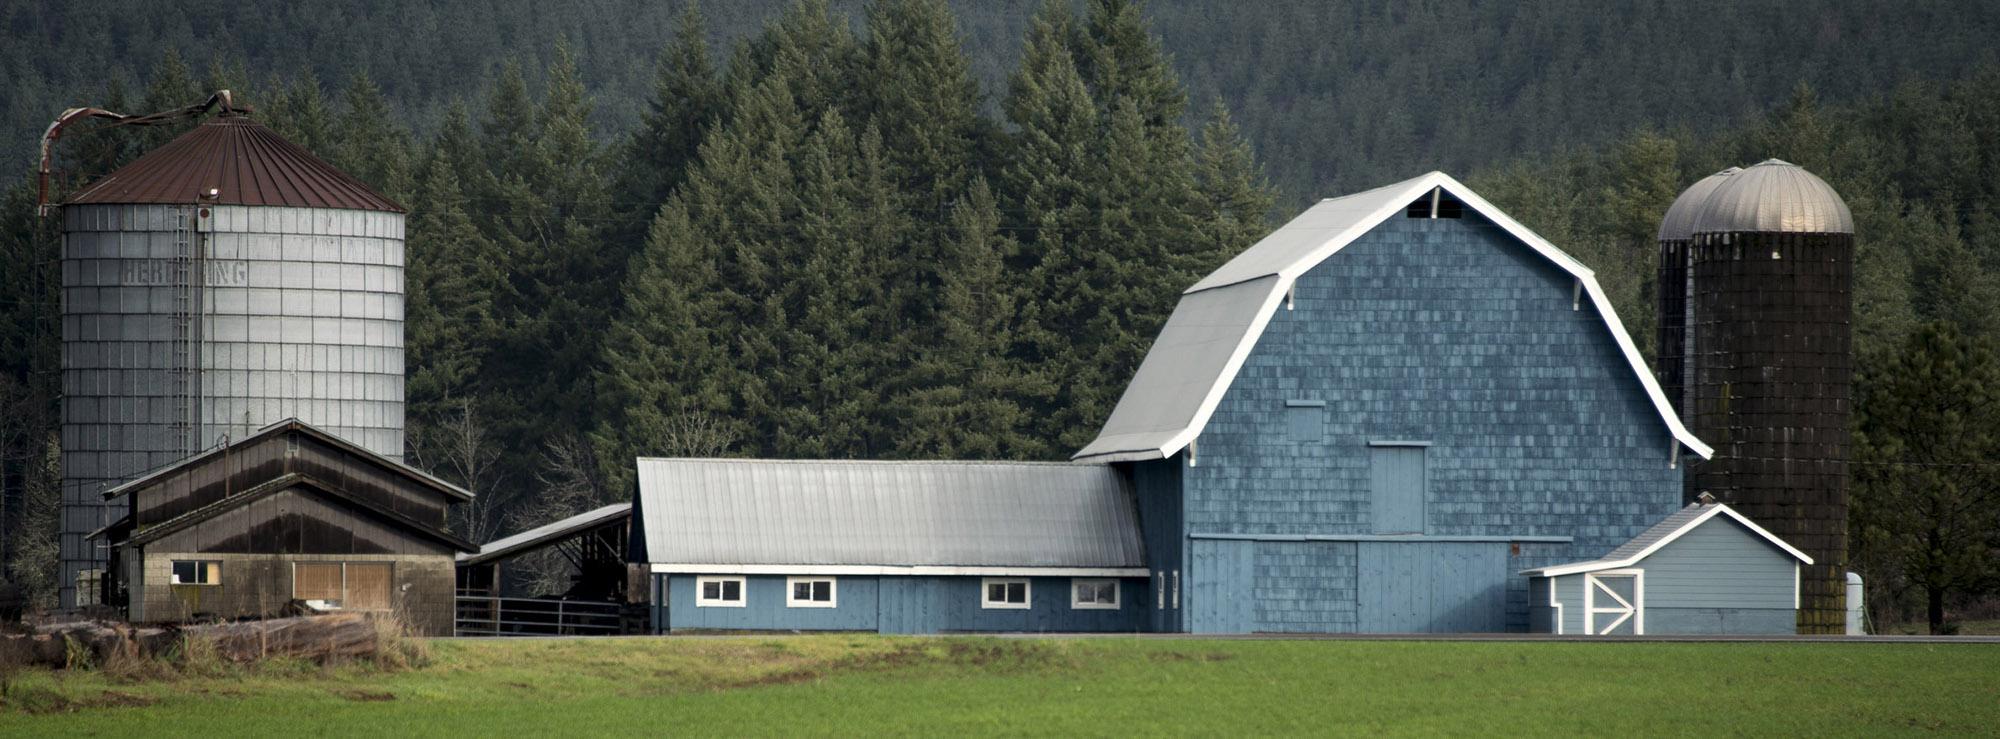 Fenn Farm